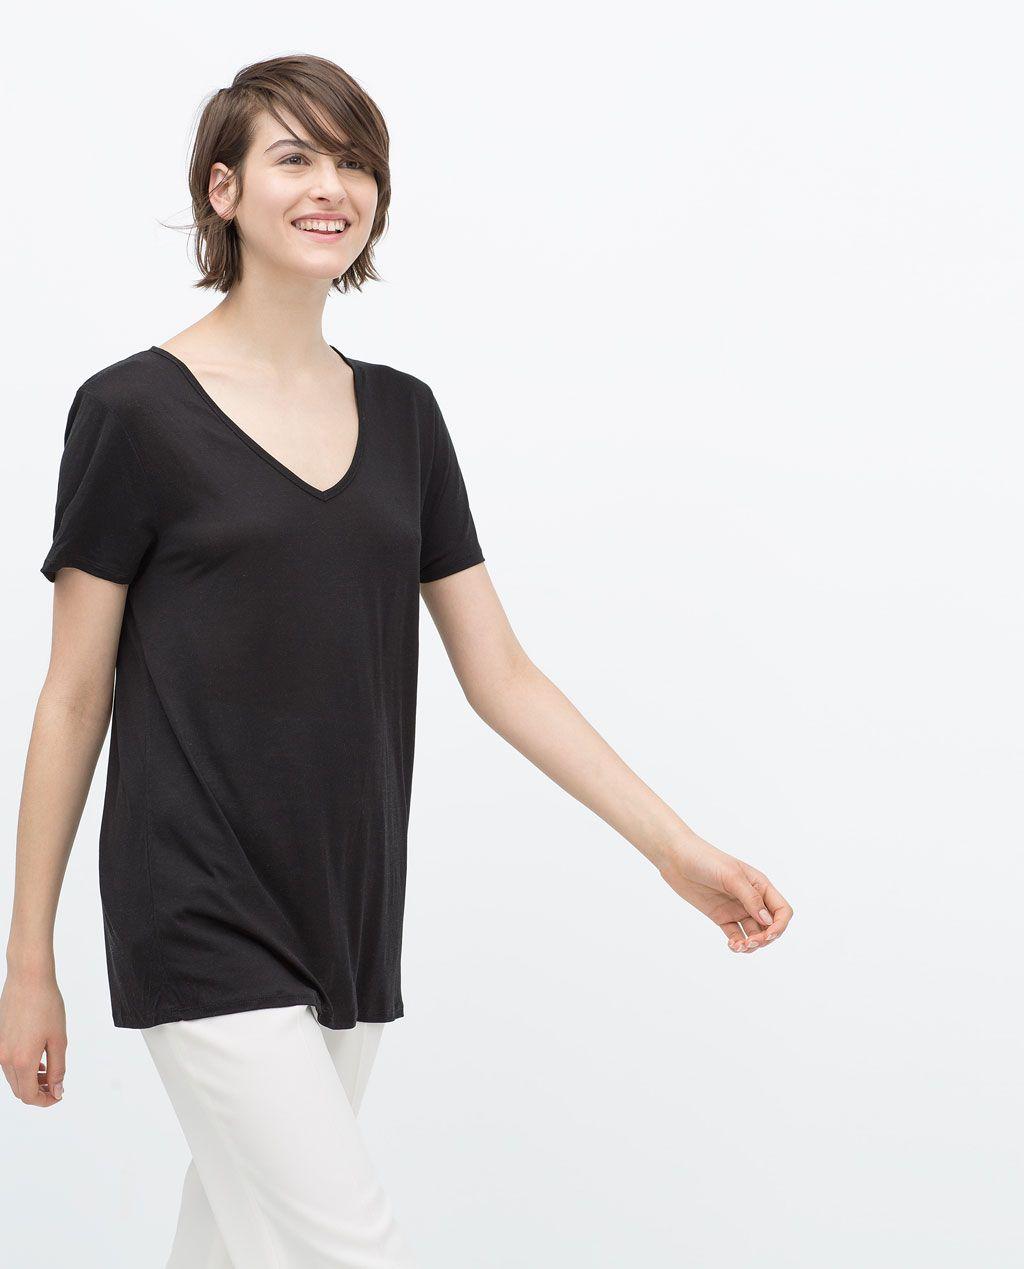 Zara woman extra long tshirt springsummer capsule